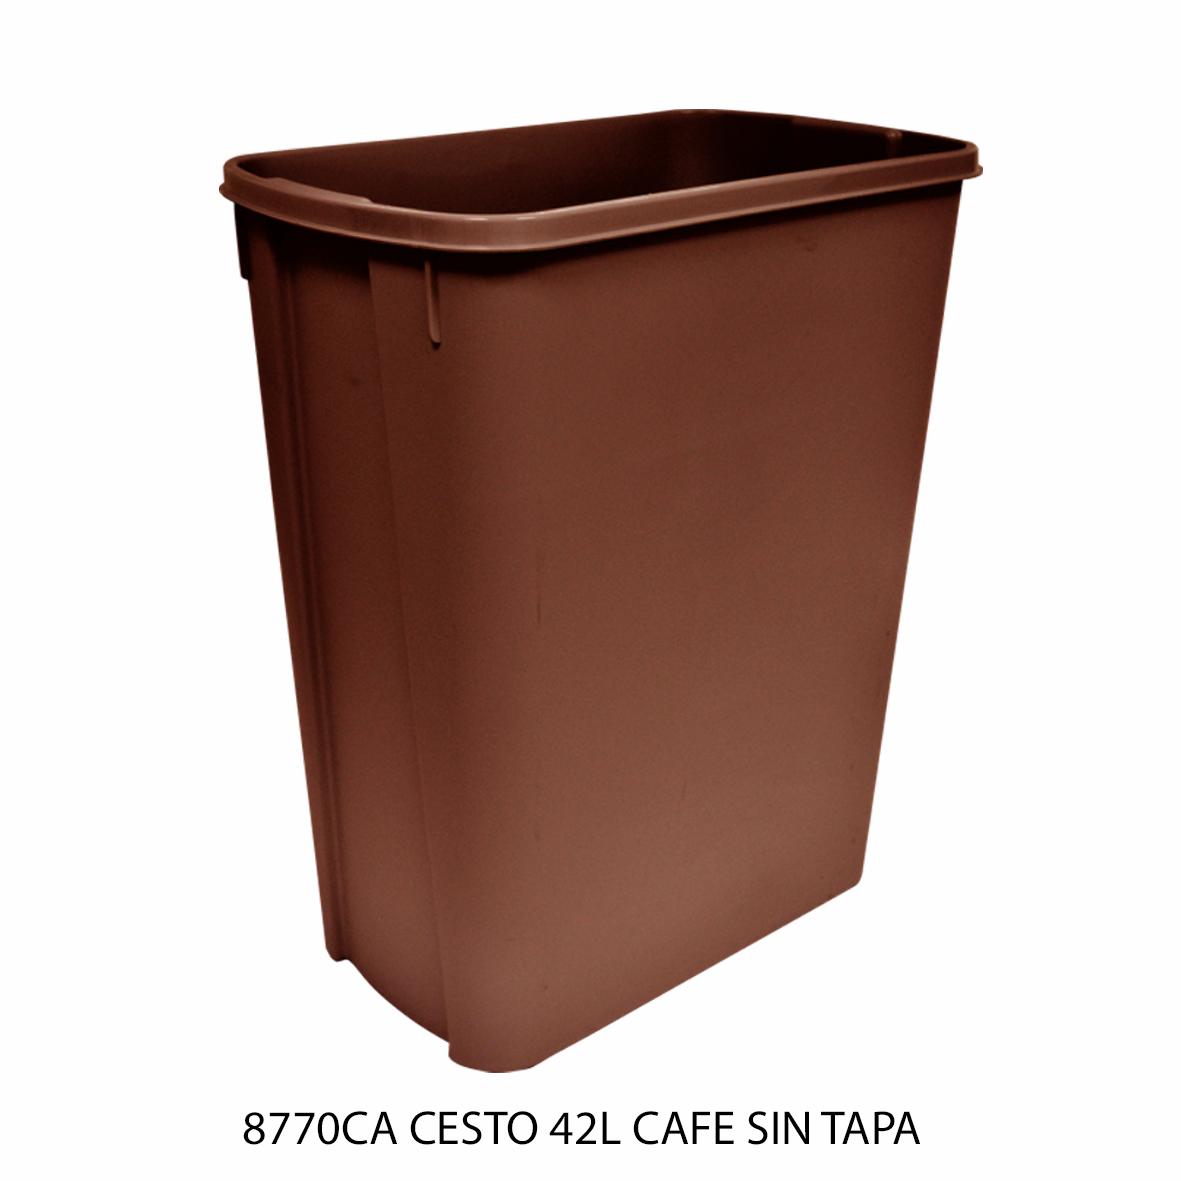 Bote de basura mediano de 42 litros sin tapa color café modelo 8770CA de Sablón